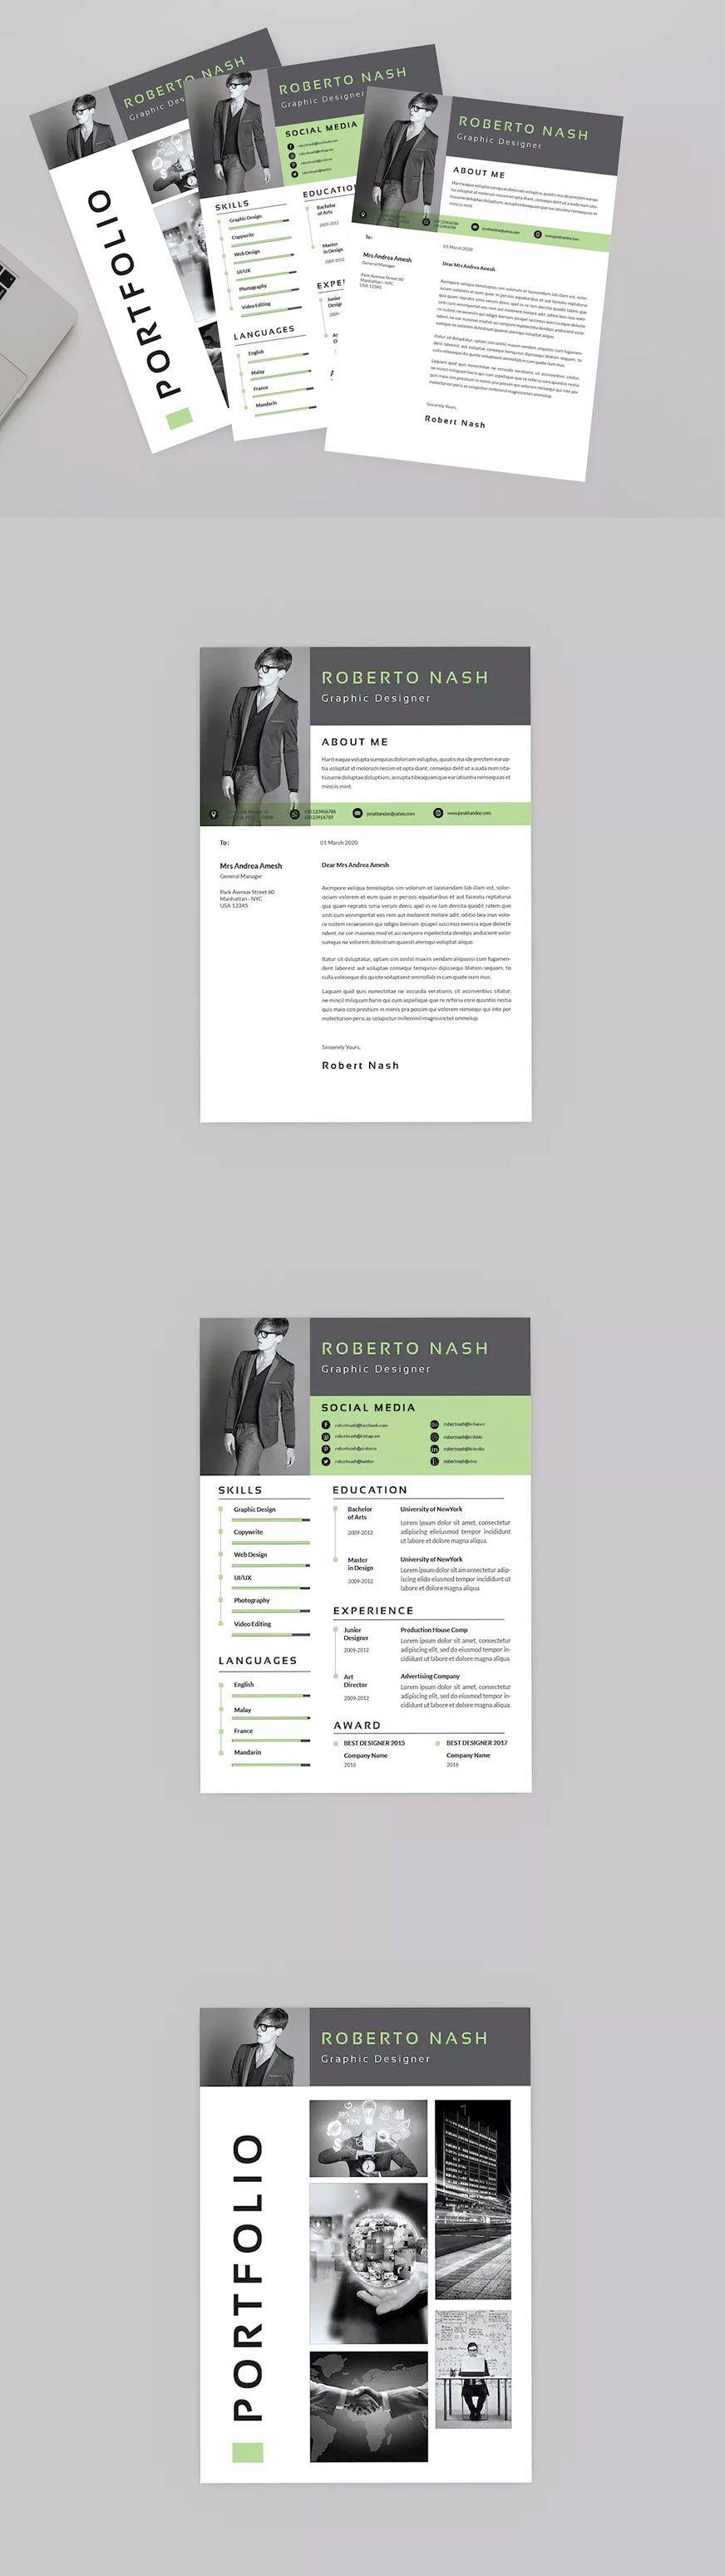 Hybrid Resume Designer by aqrstudio on Envato Elements